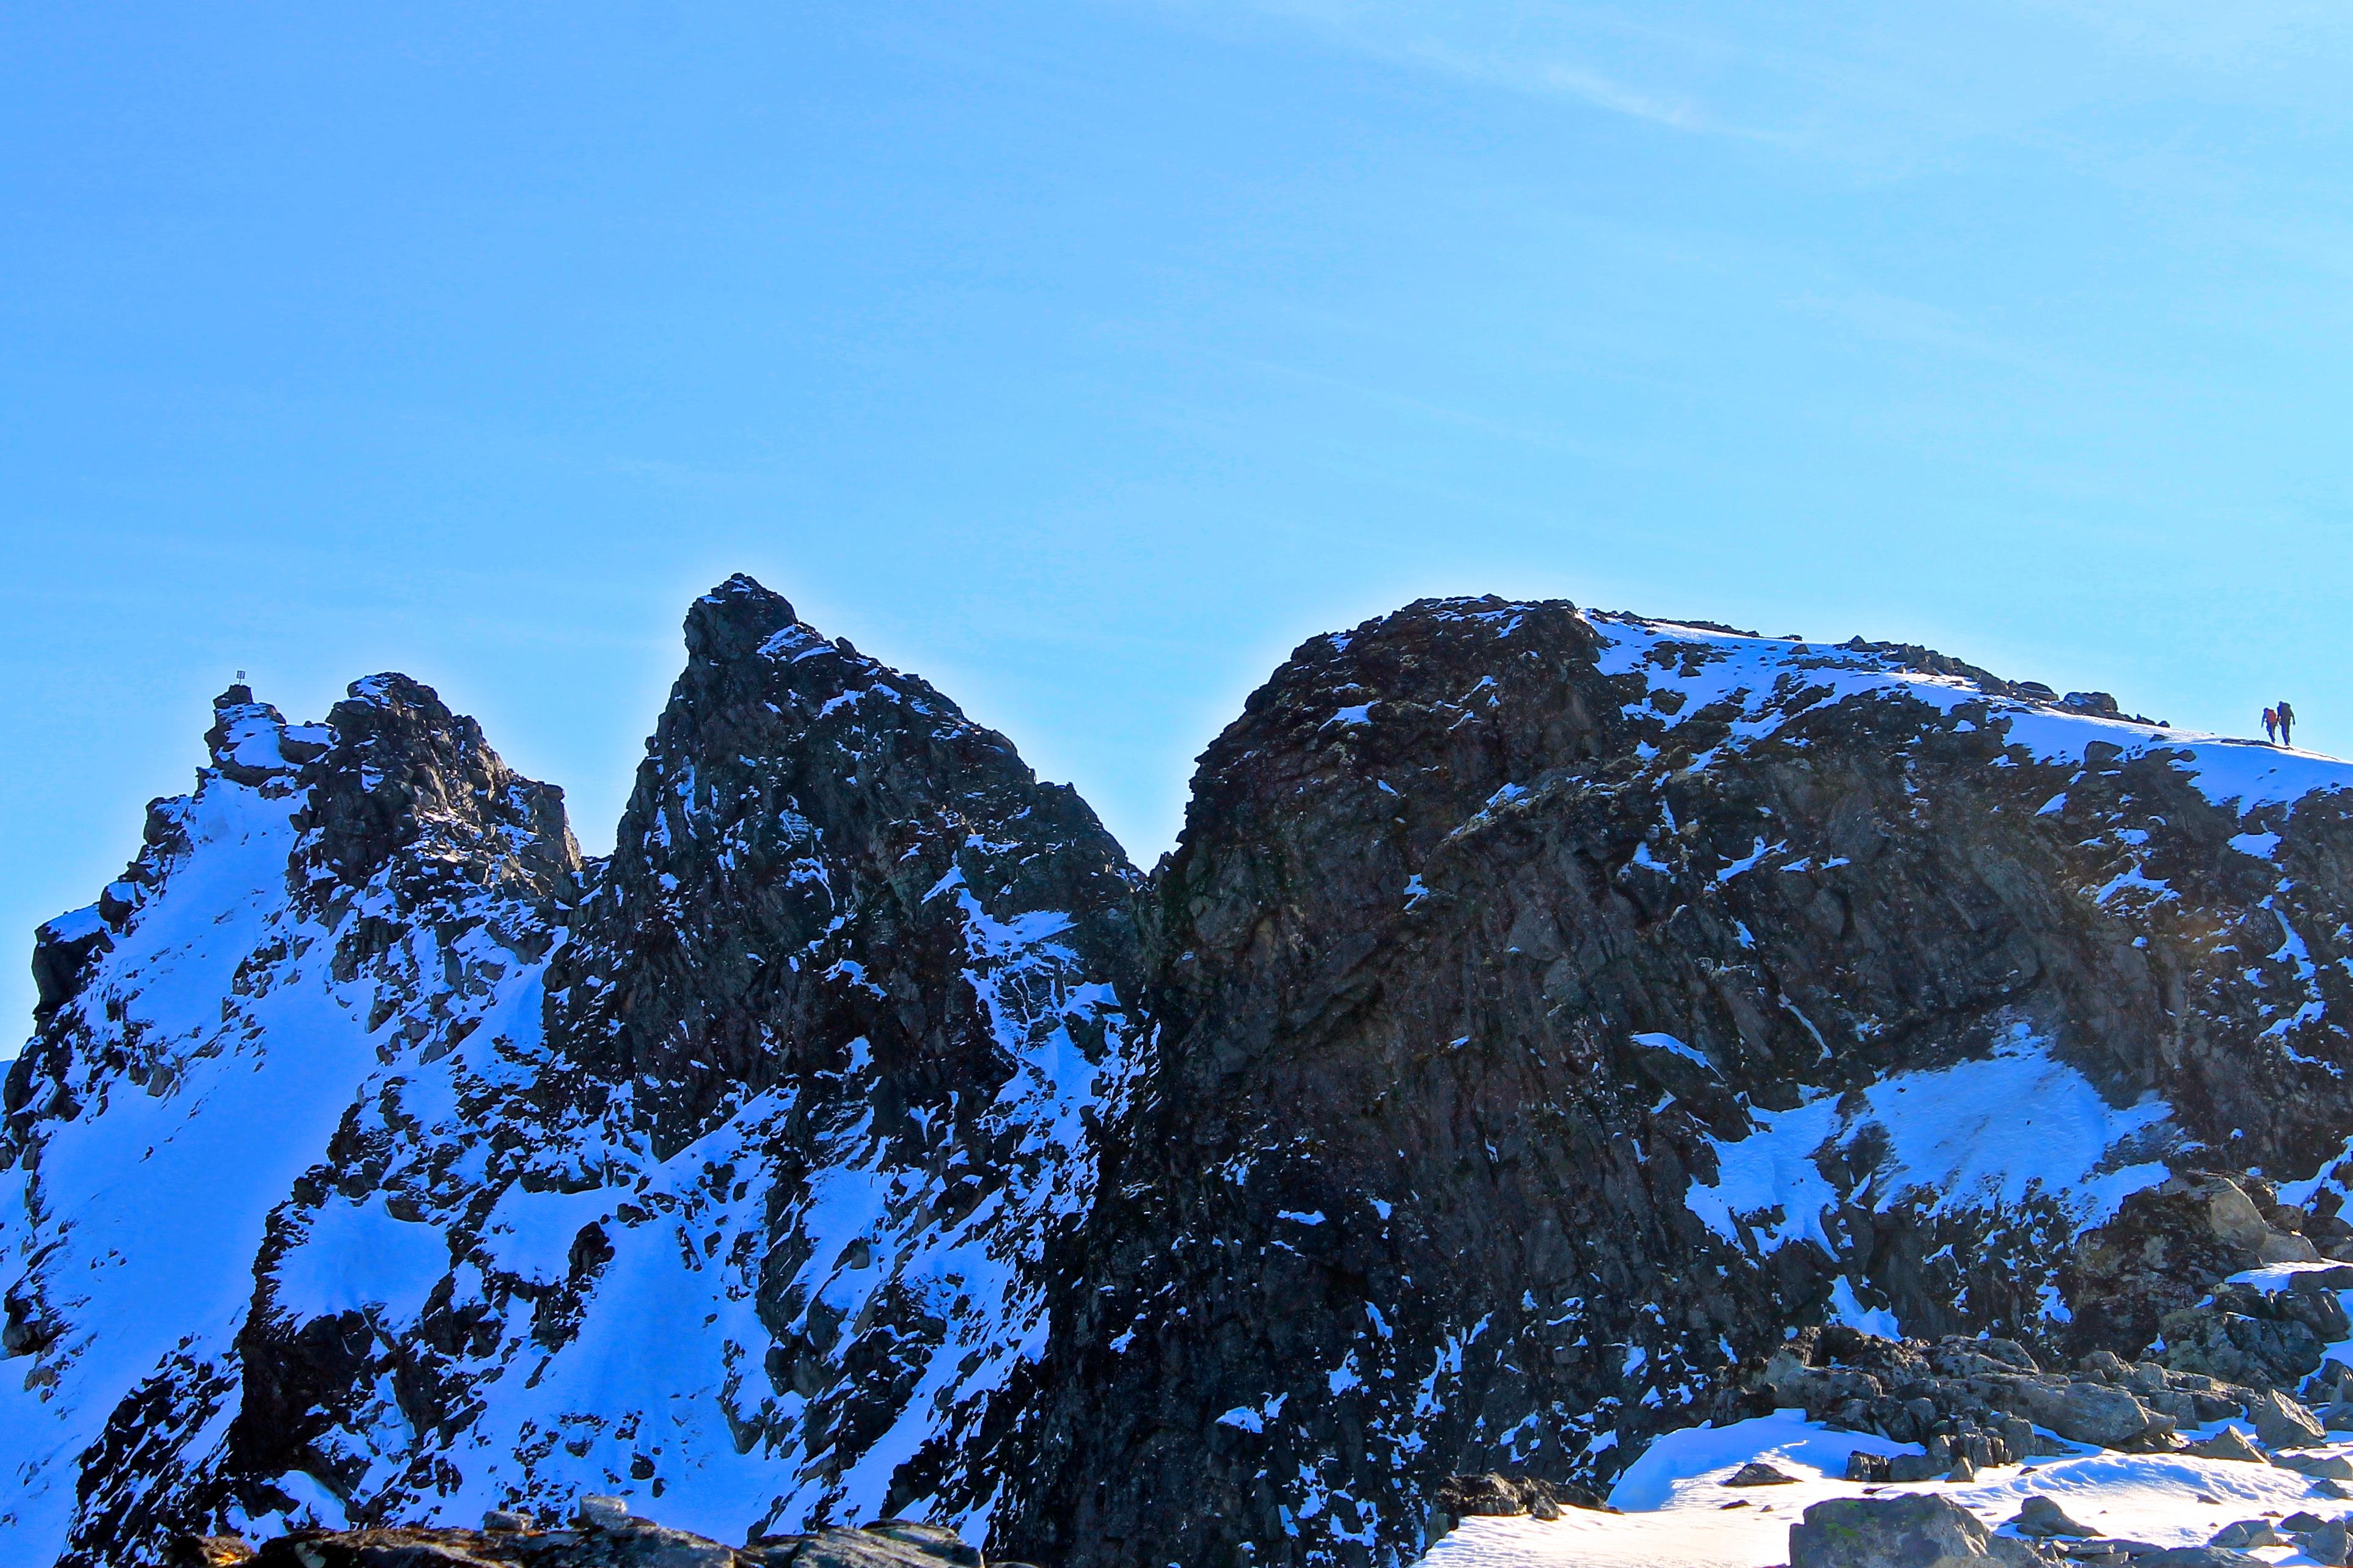 Dyrhaugstindtraversen med Store Dyrhaugstind (2.150 moh) til venstre i bildet.